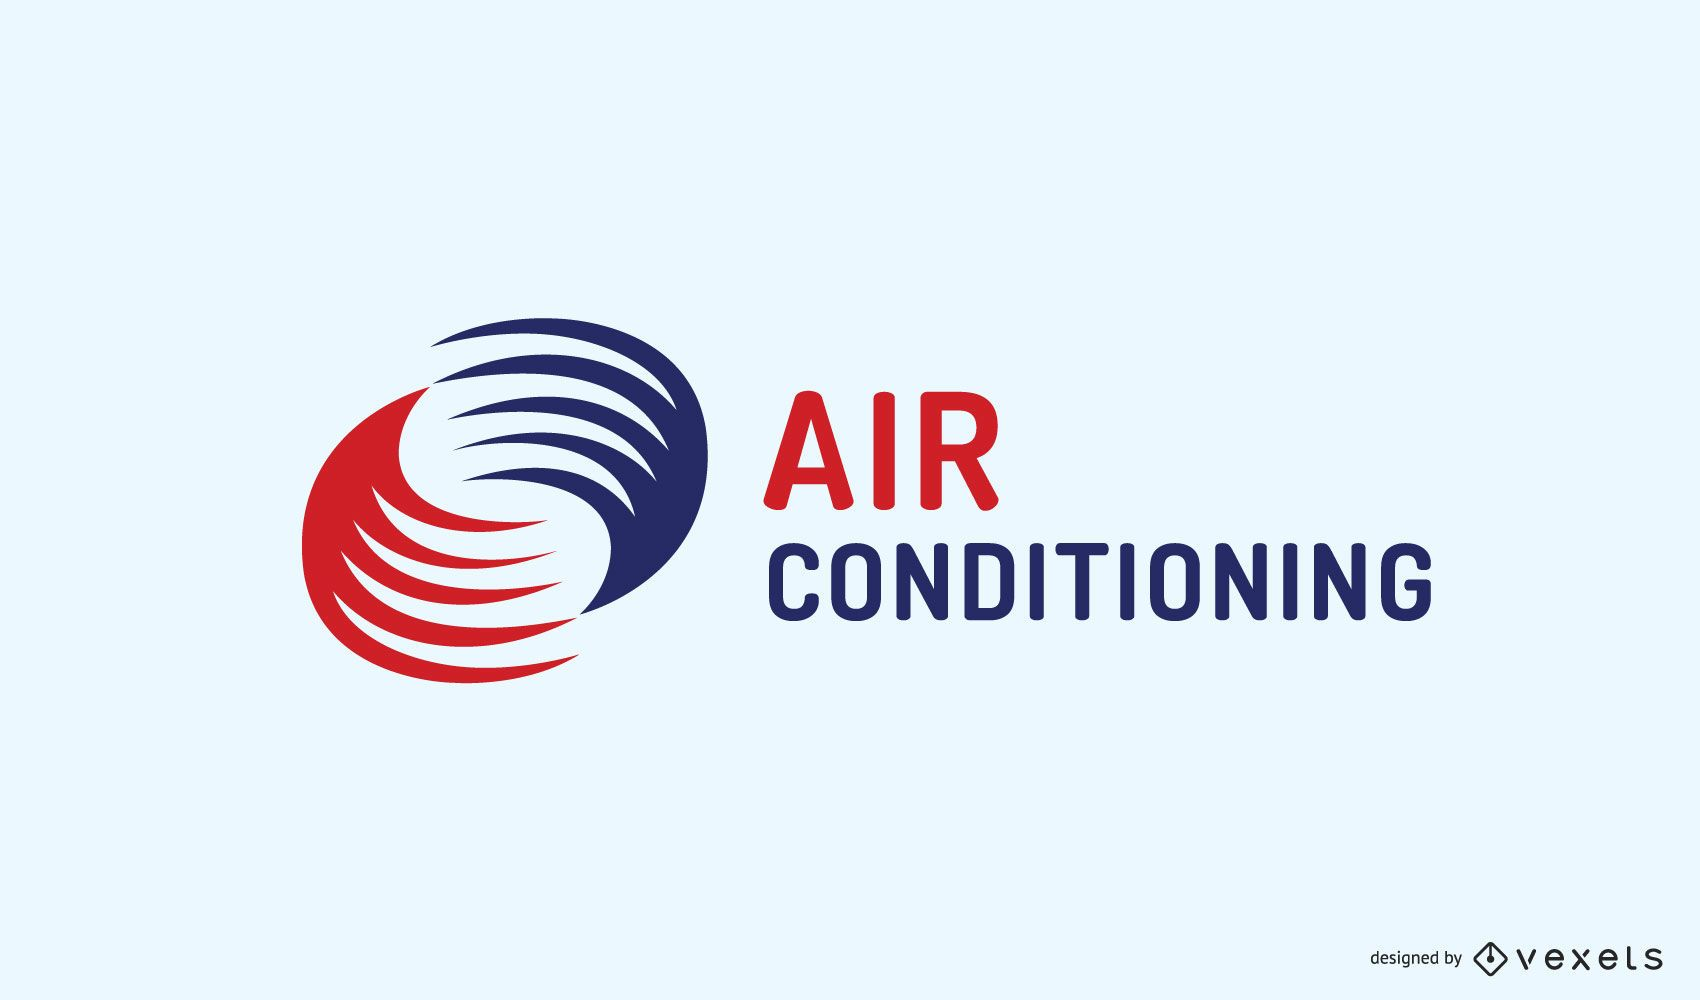 Air Conditioning Business Logo Design